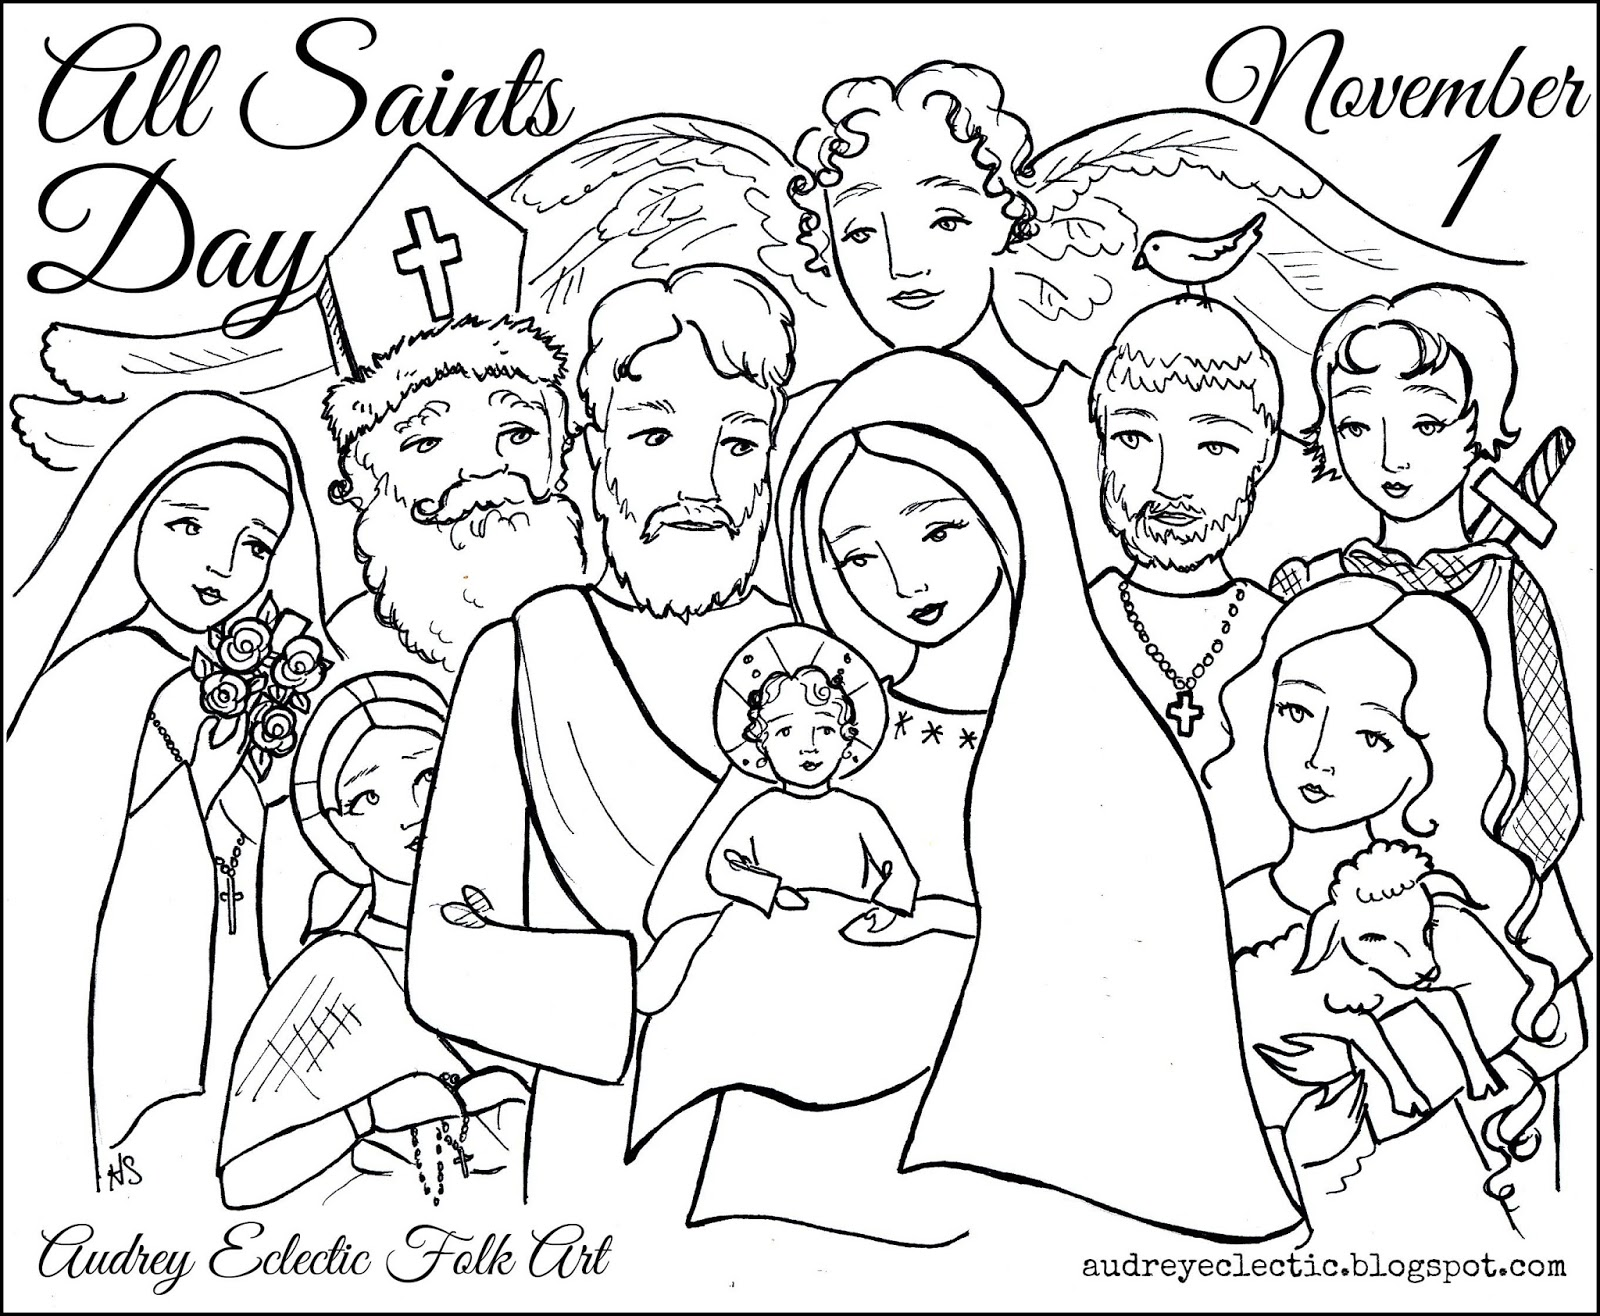 All Saints Day Festivities